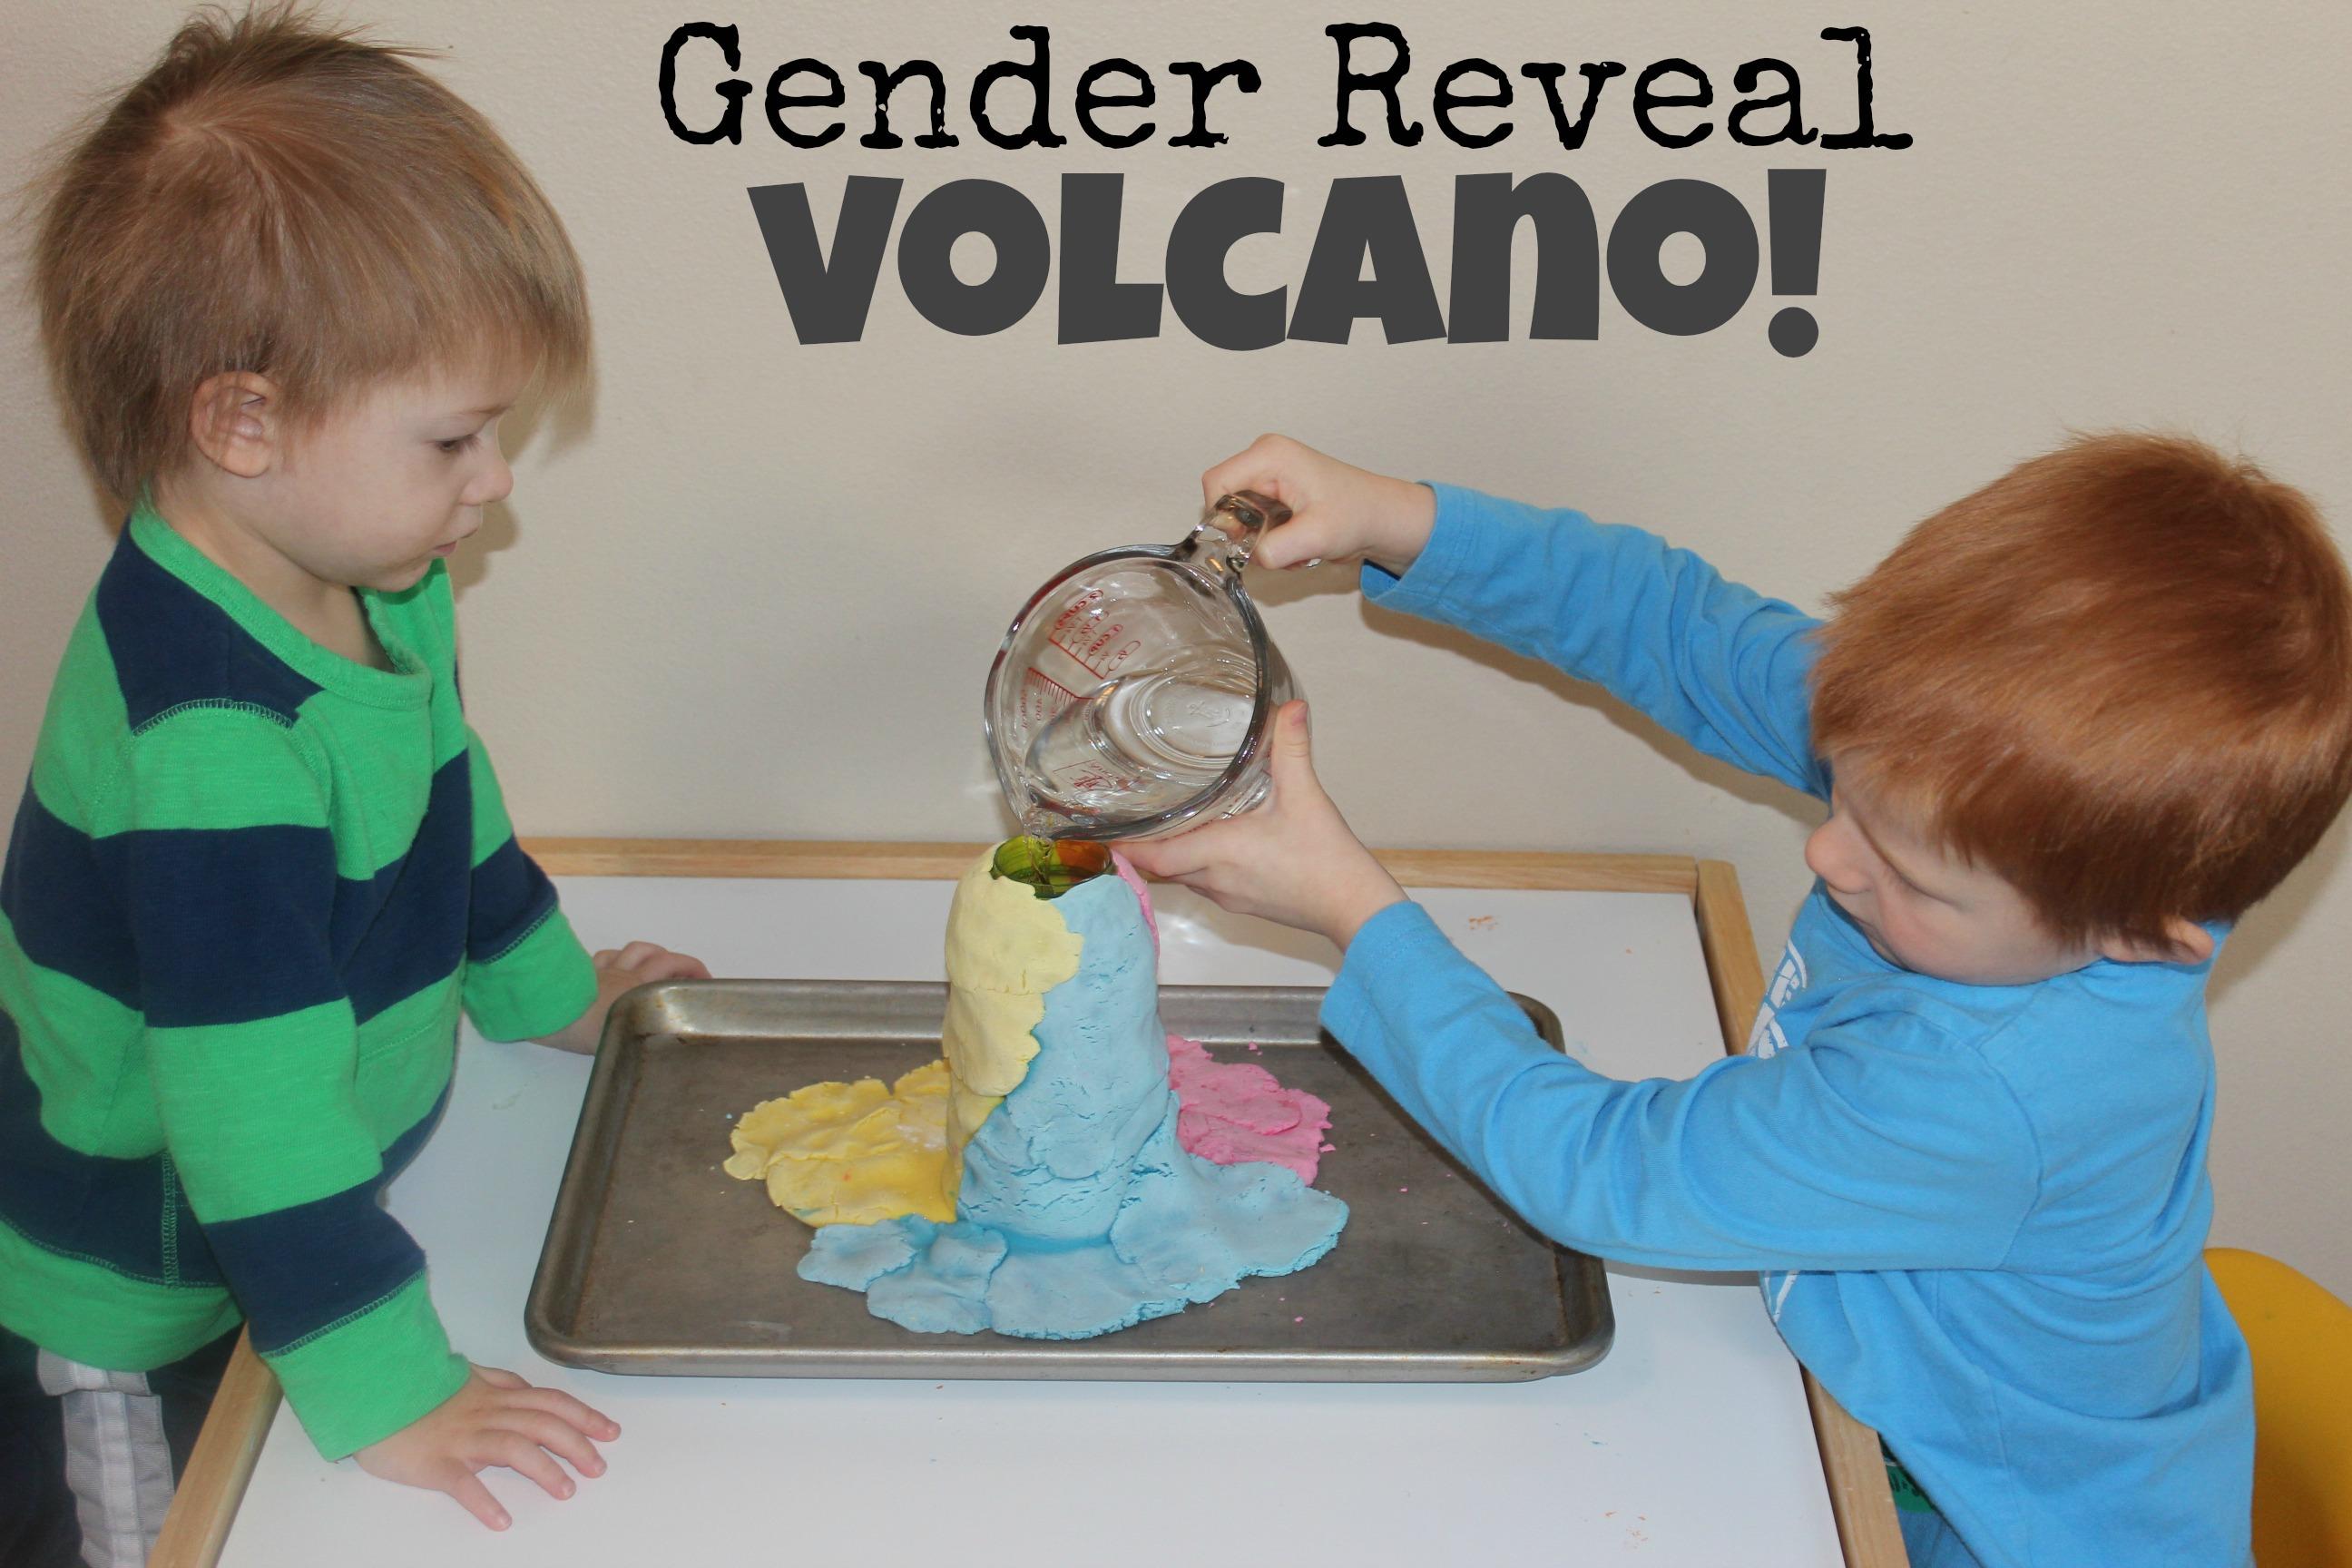 Gender Reveal Volcano